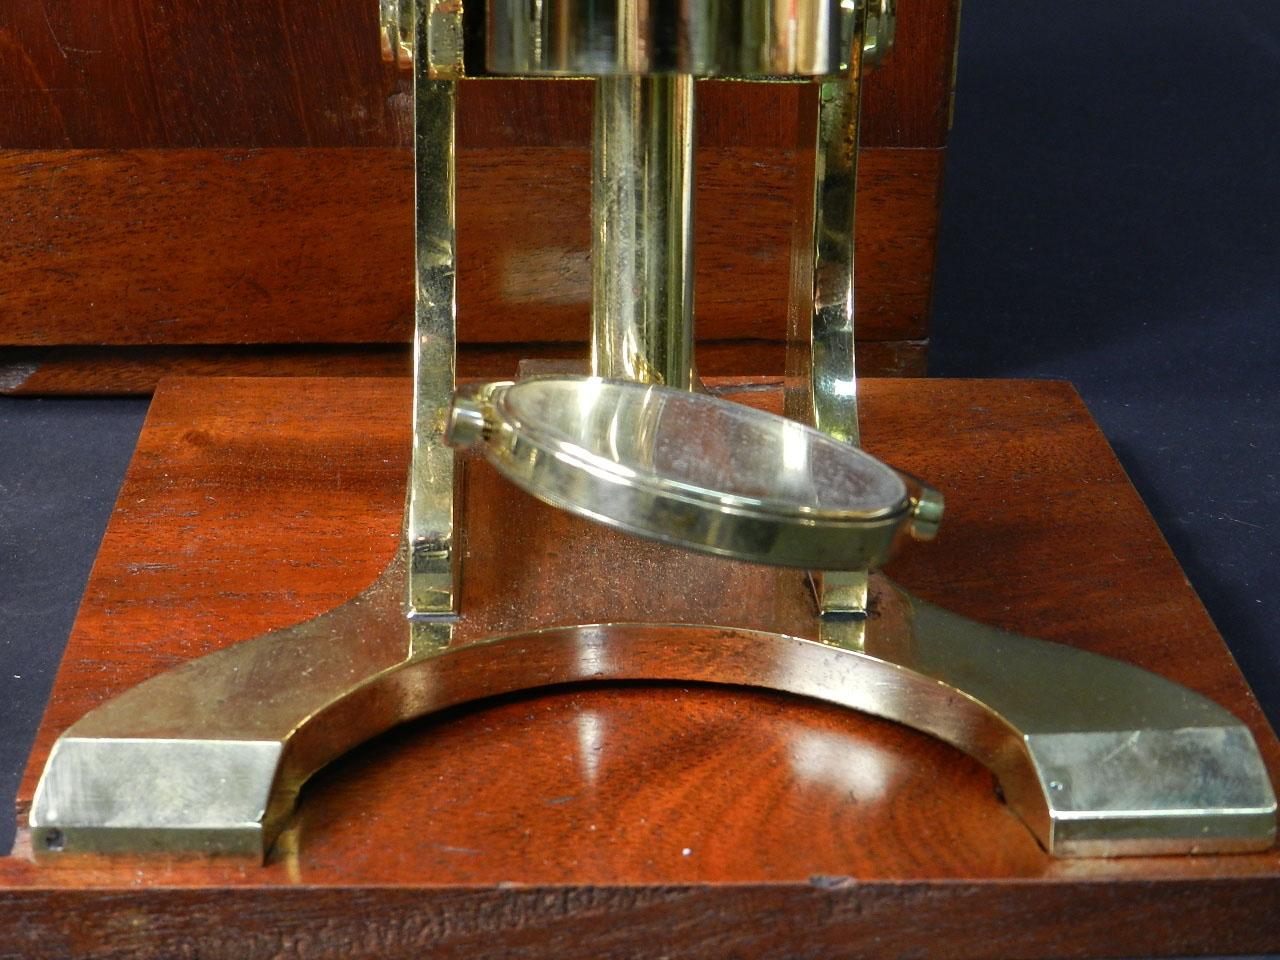 Imagen MICROSCOPIO BINOCULAR H.W. CROUCH AÑO 1862 24901